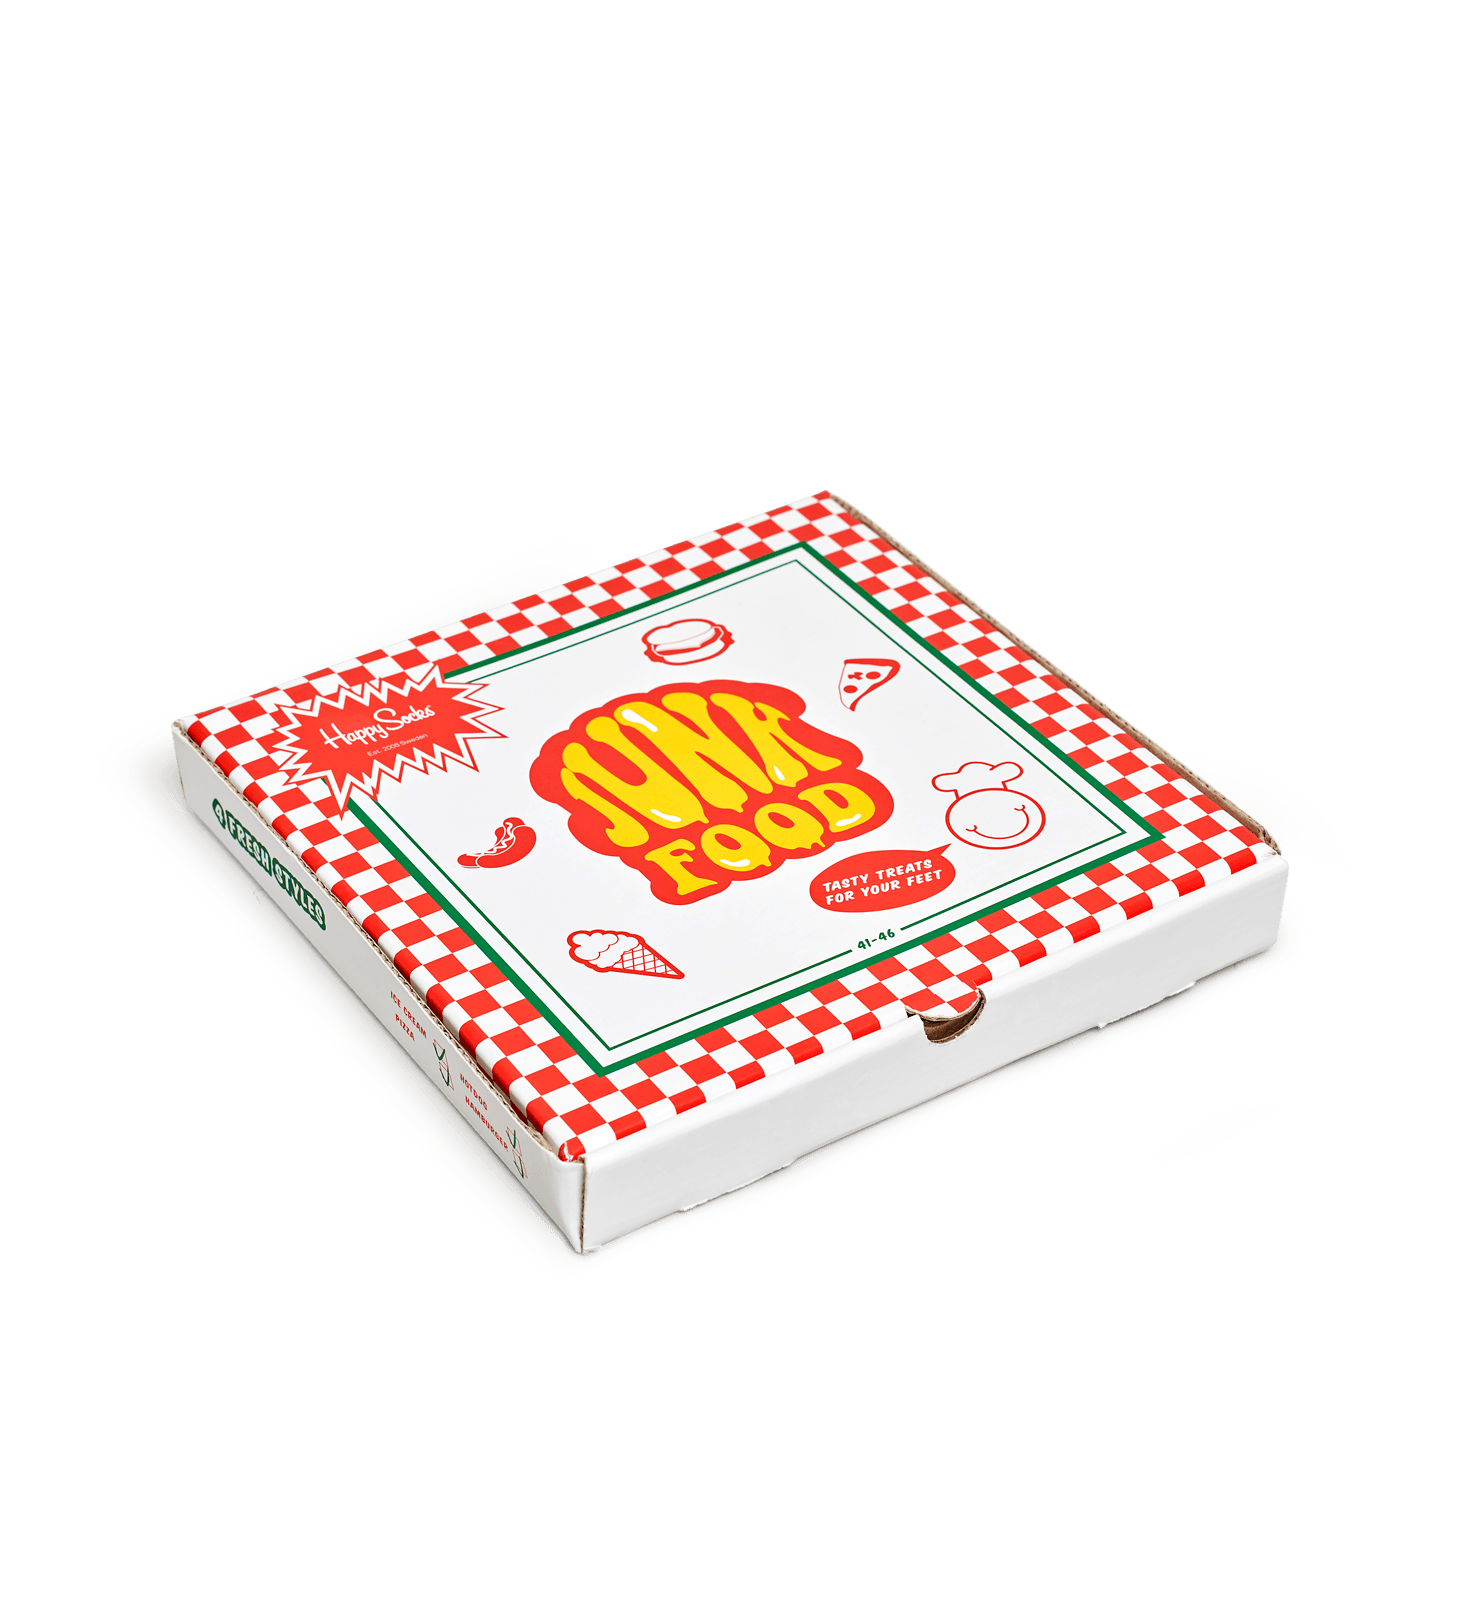 Junkfood Gift Box